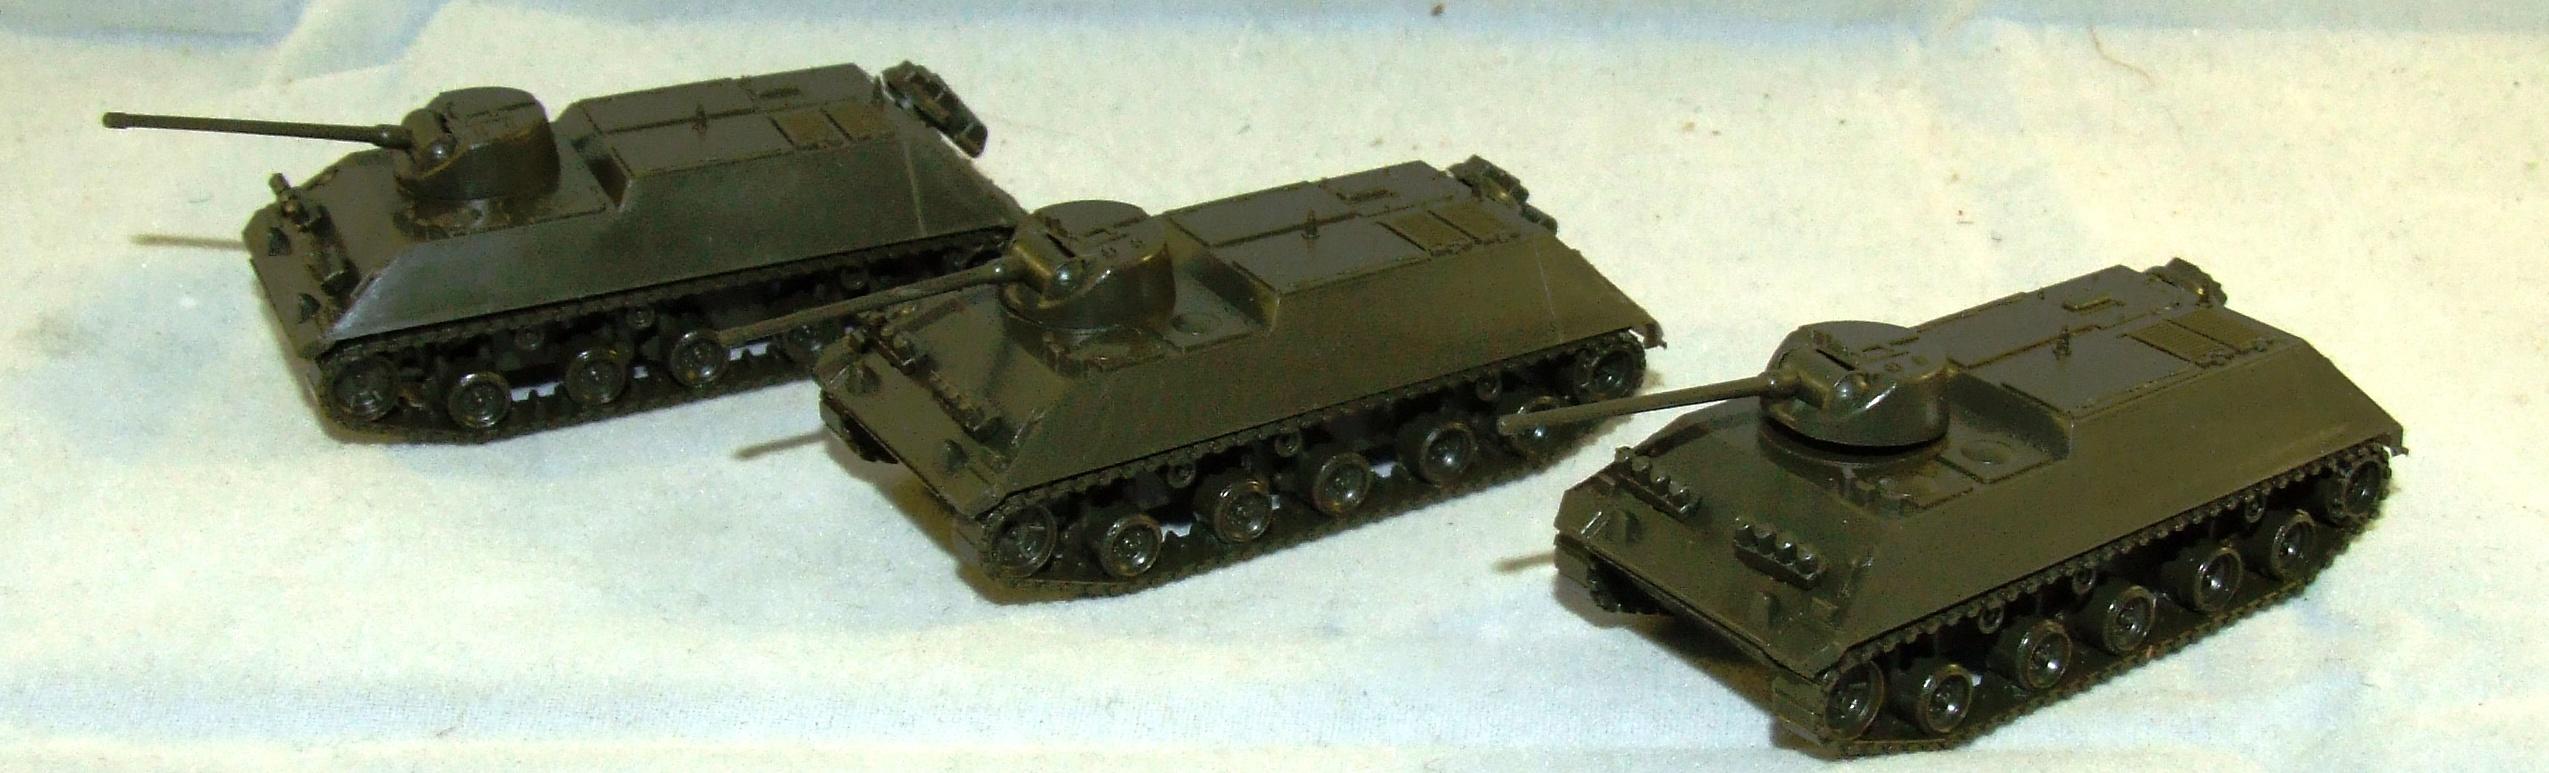 3 x 743990 Roco Minitanks Schützenpanzer Zug HS 30 20mm BW  H0 1:87